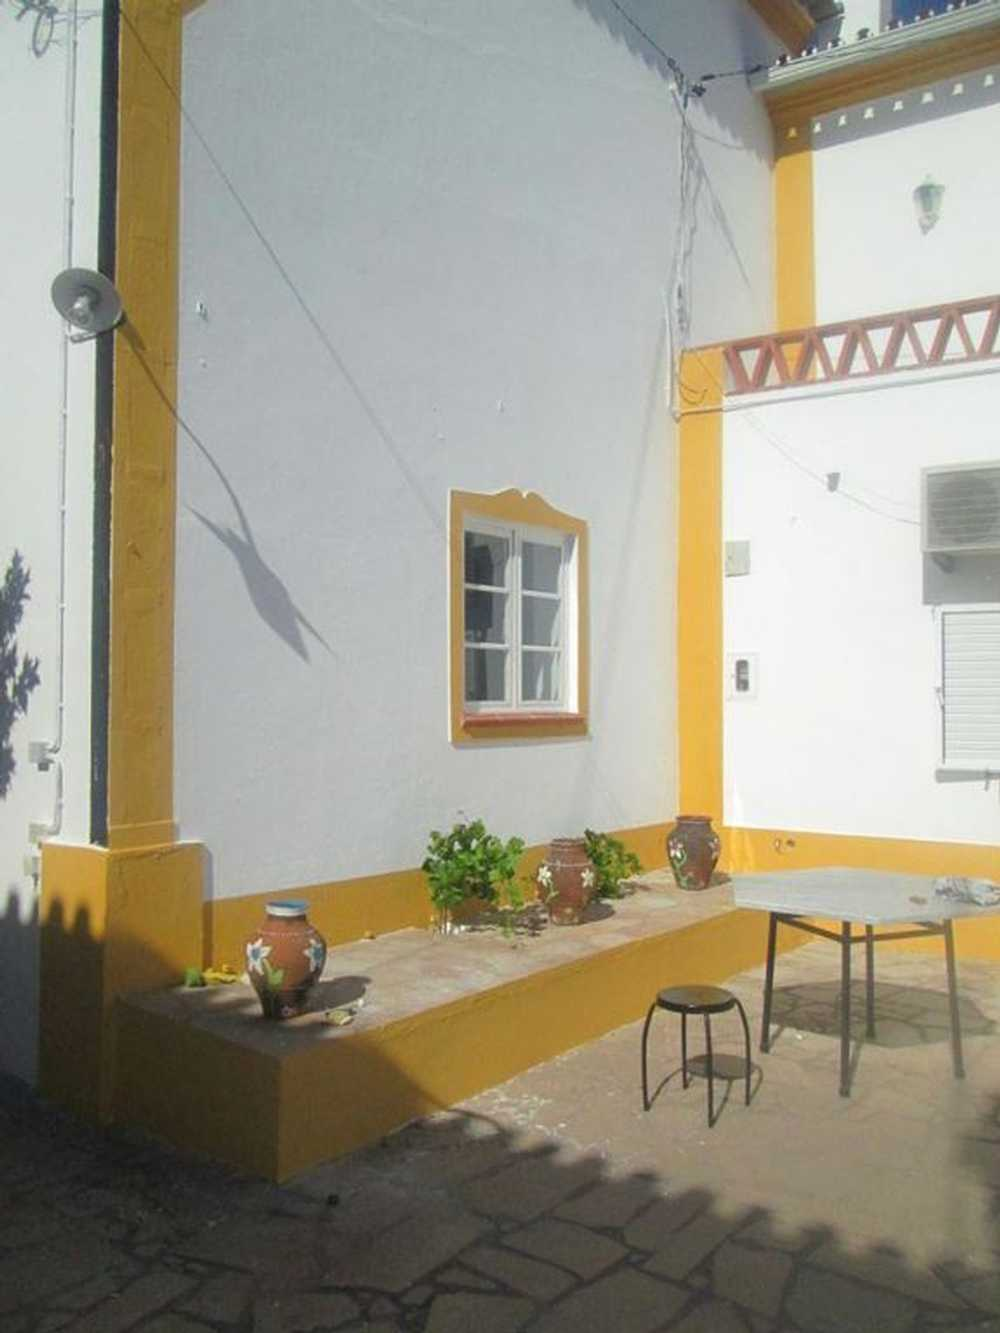 Crato Crato casa imagem 114867